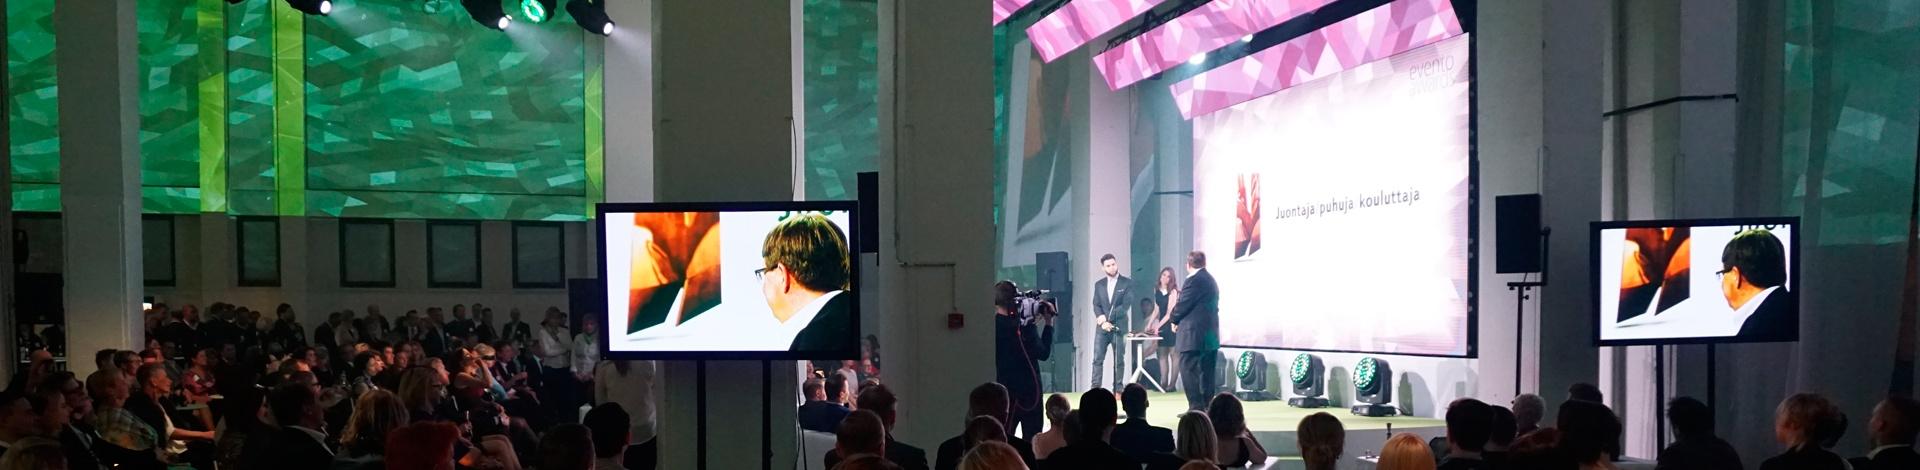 Event Awards palkintogaala